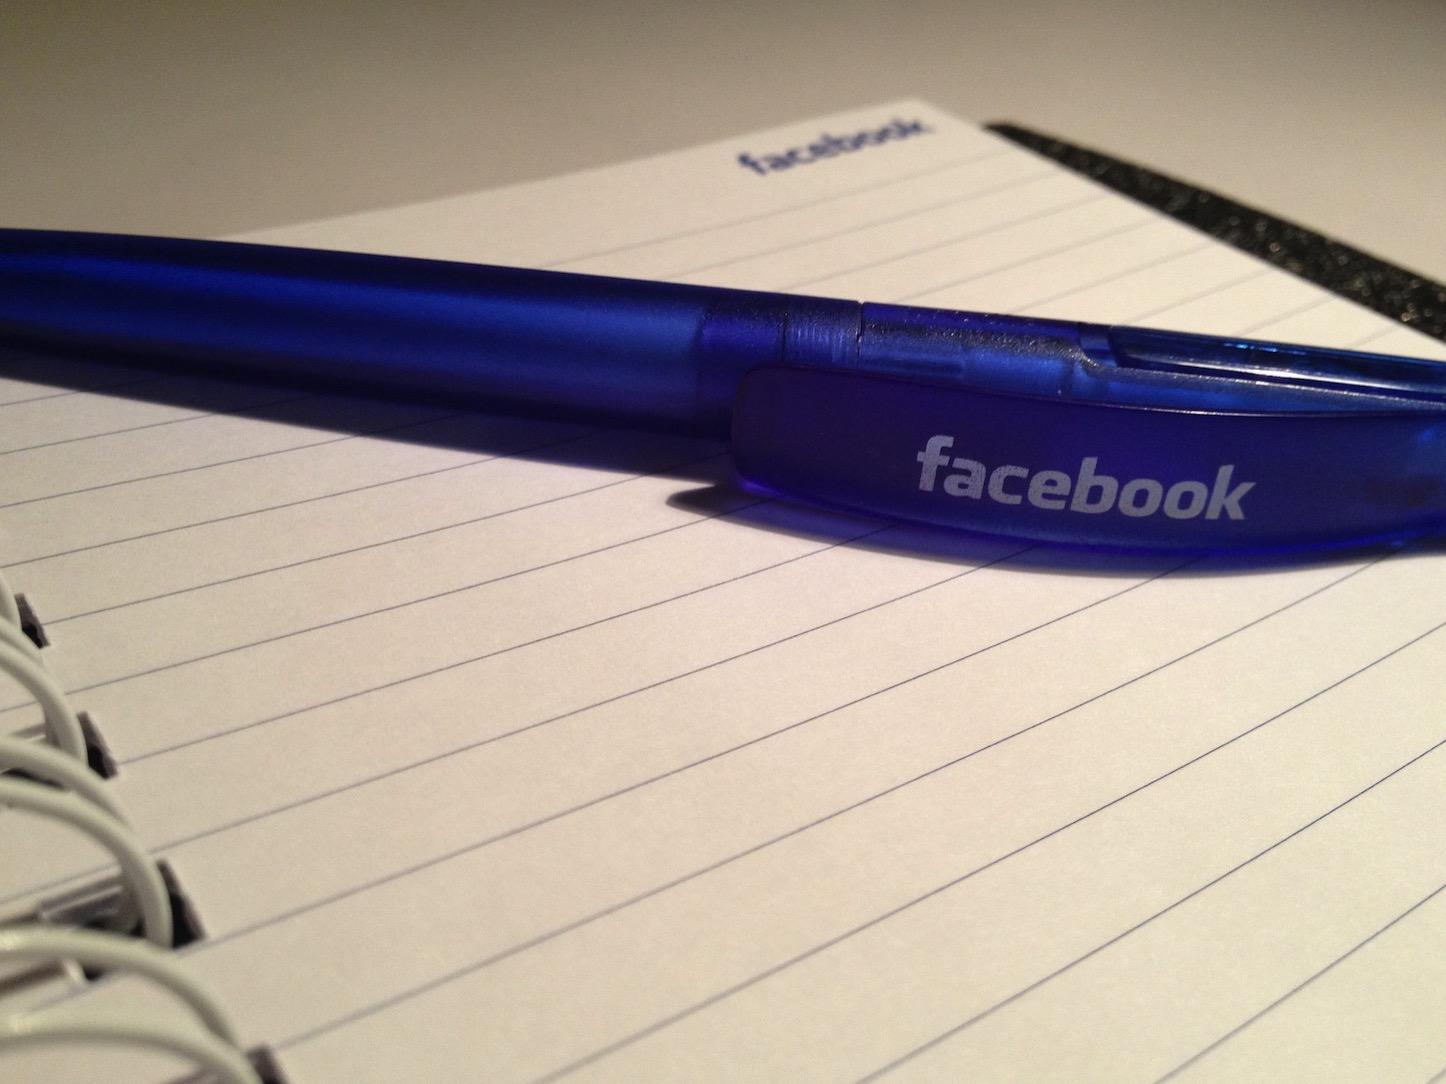 Facebook pen and notebook